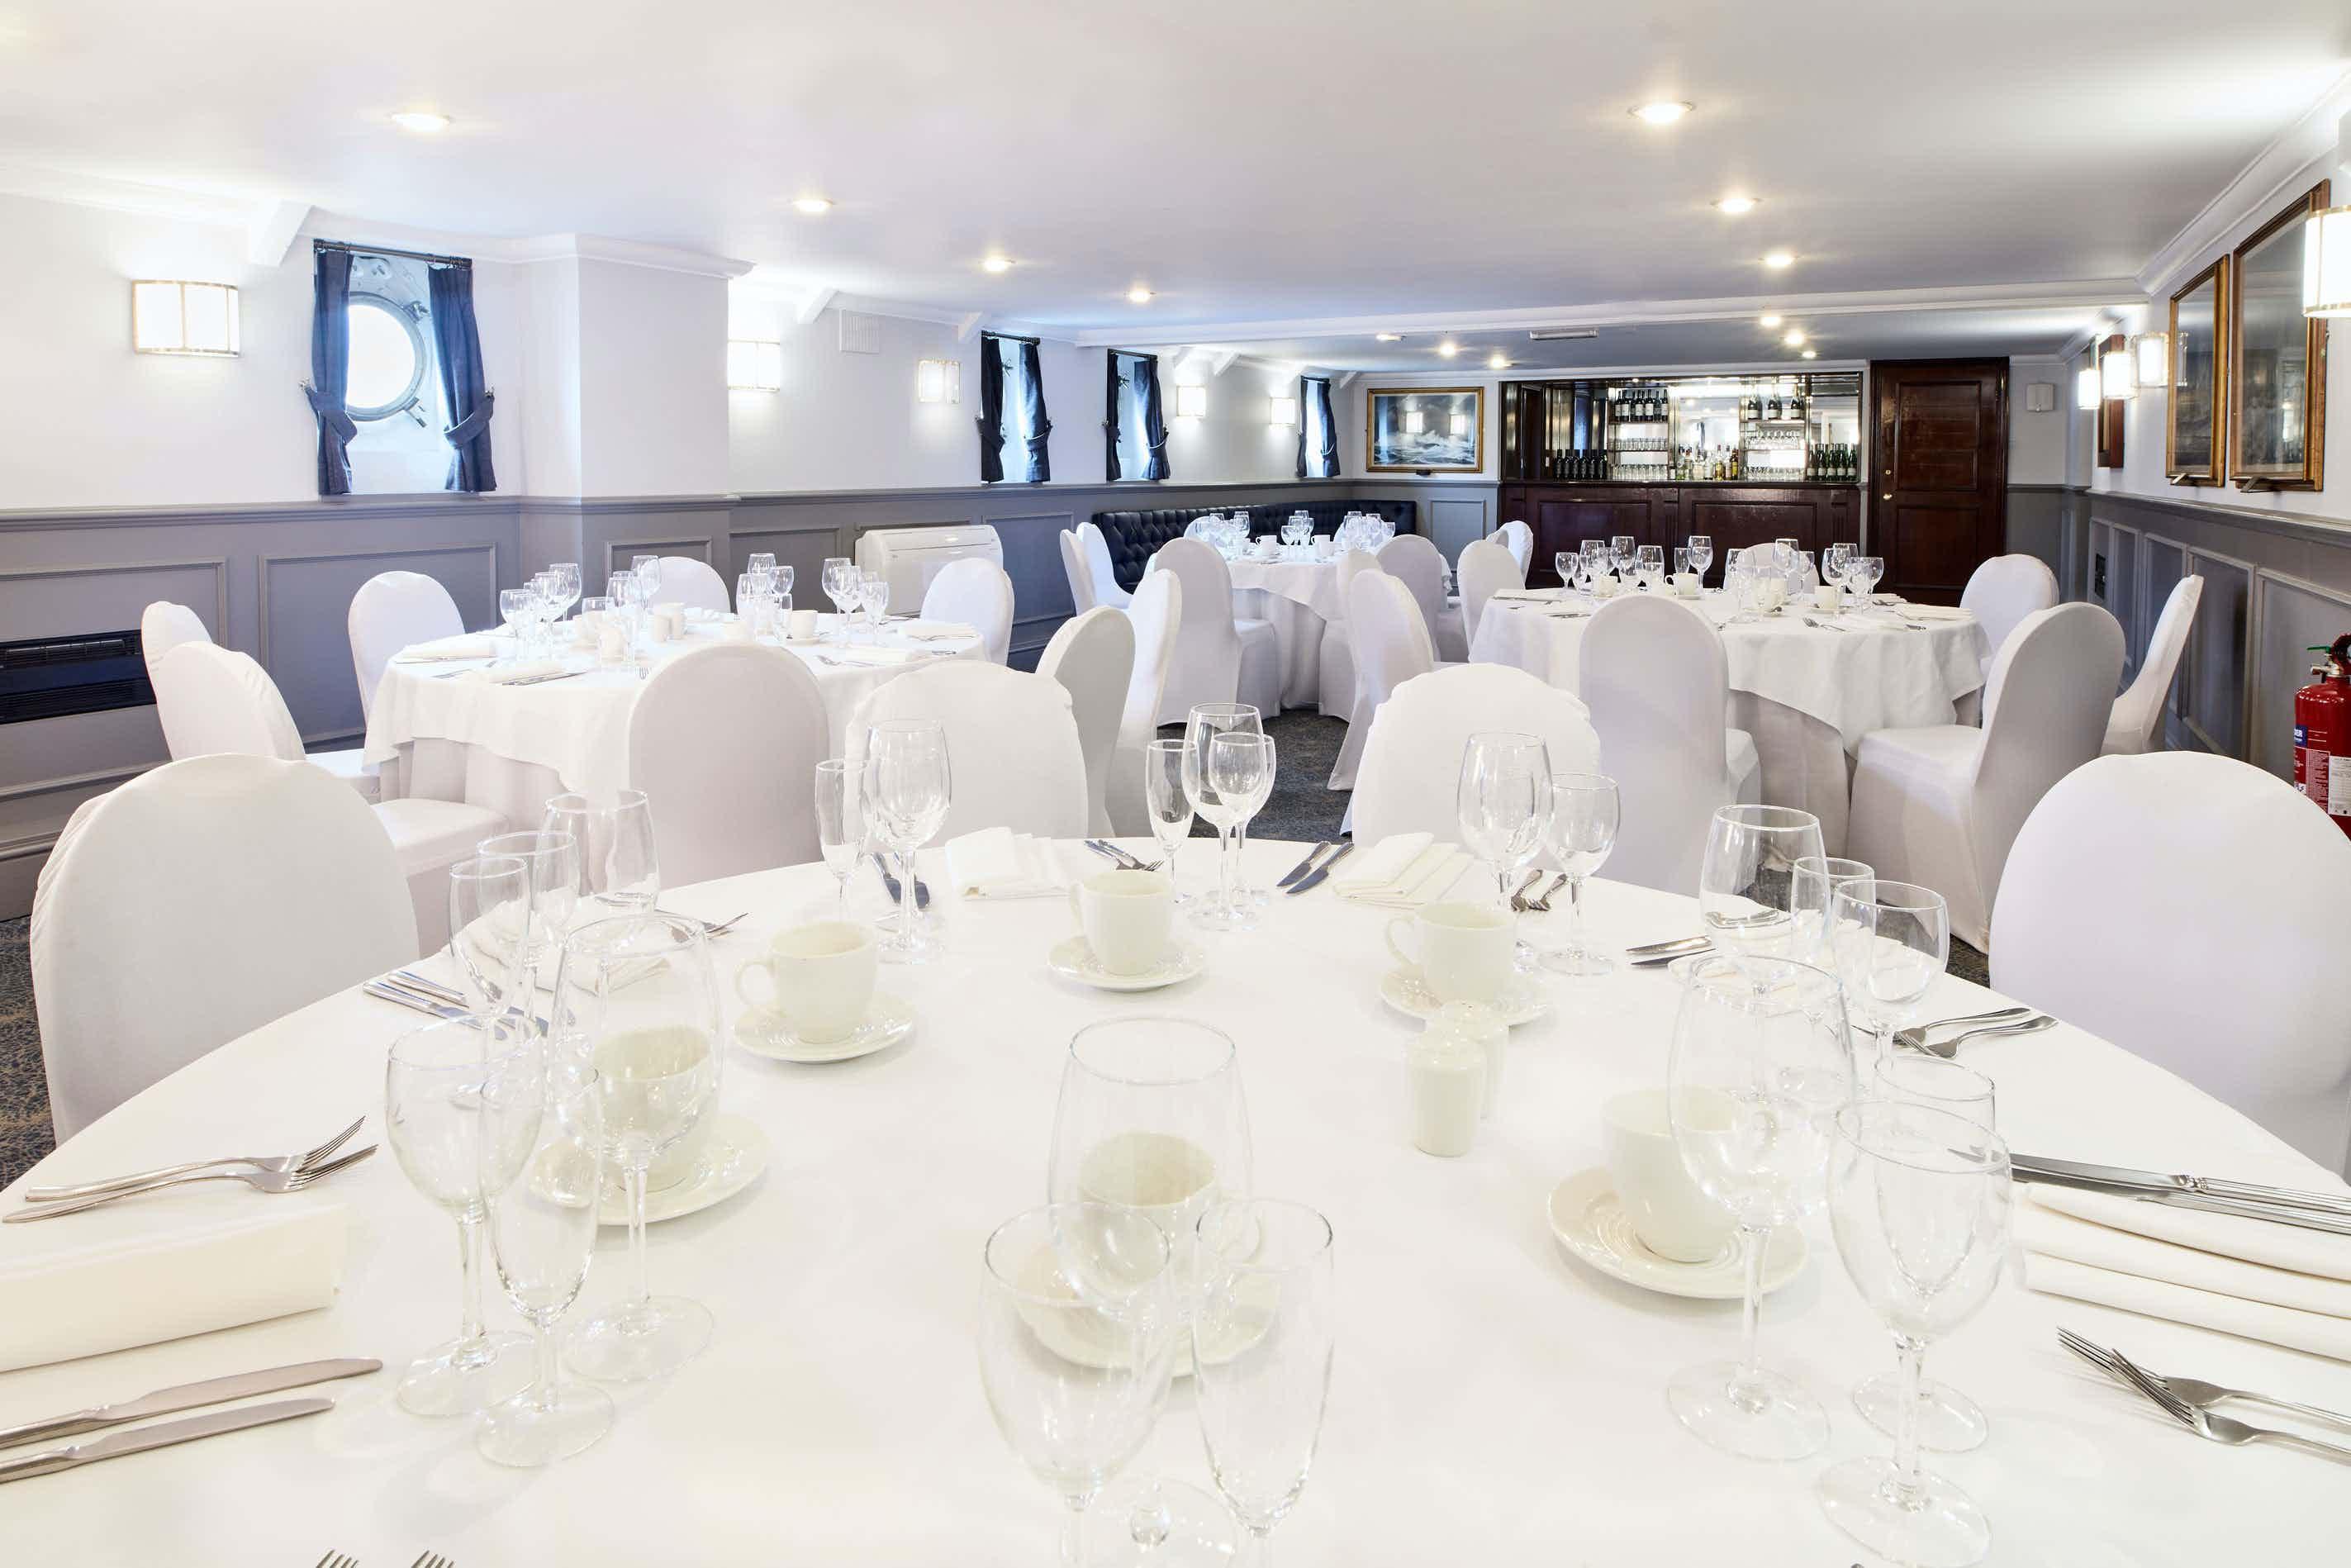 The Morgan Giles Room, HMS Belfast